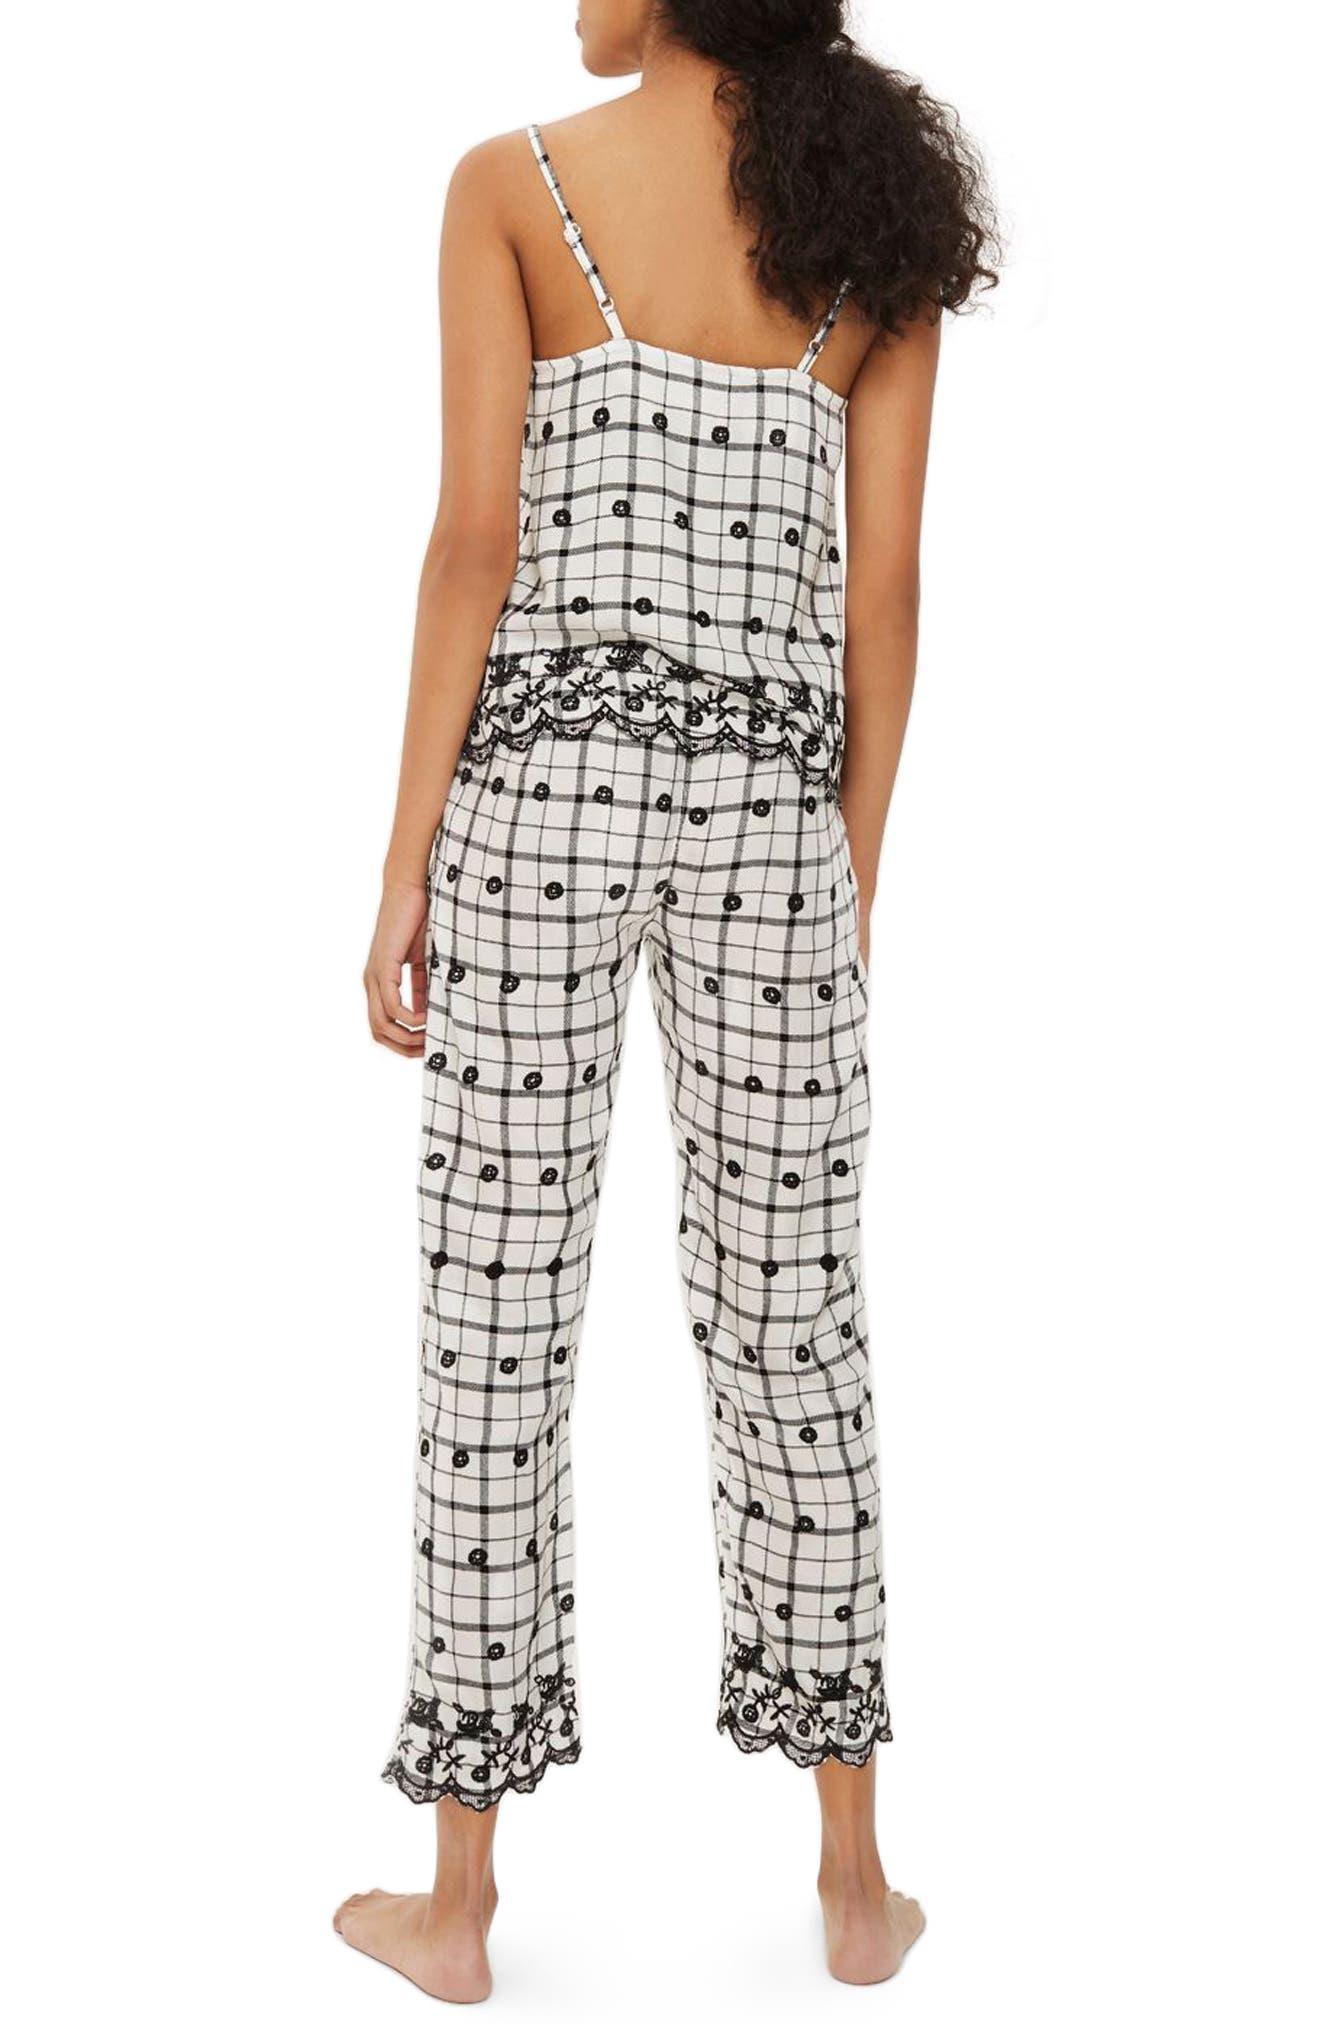 Embroidered Pajama Pants,                             Alternate thumbnail 2, color,                             White Multi